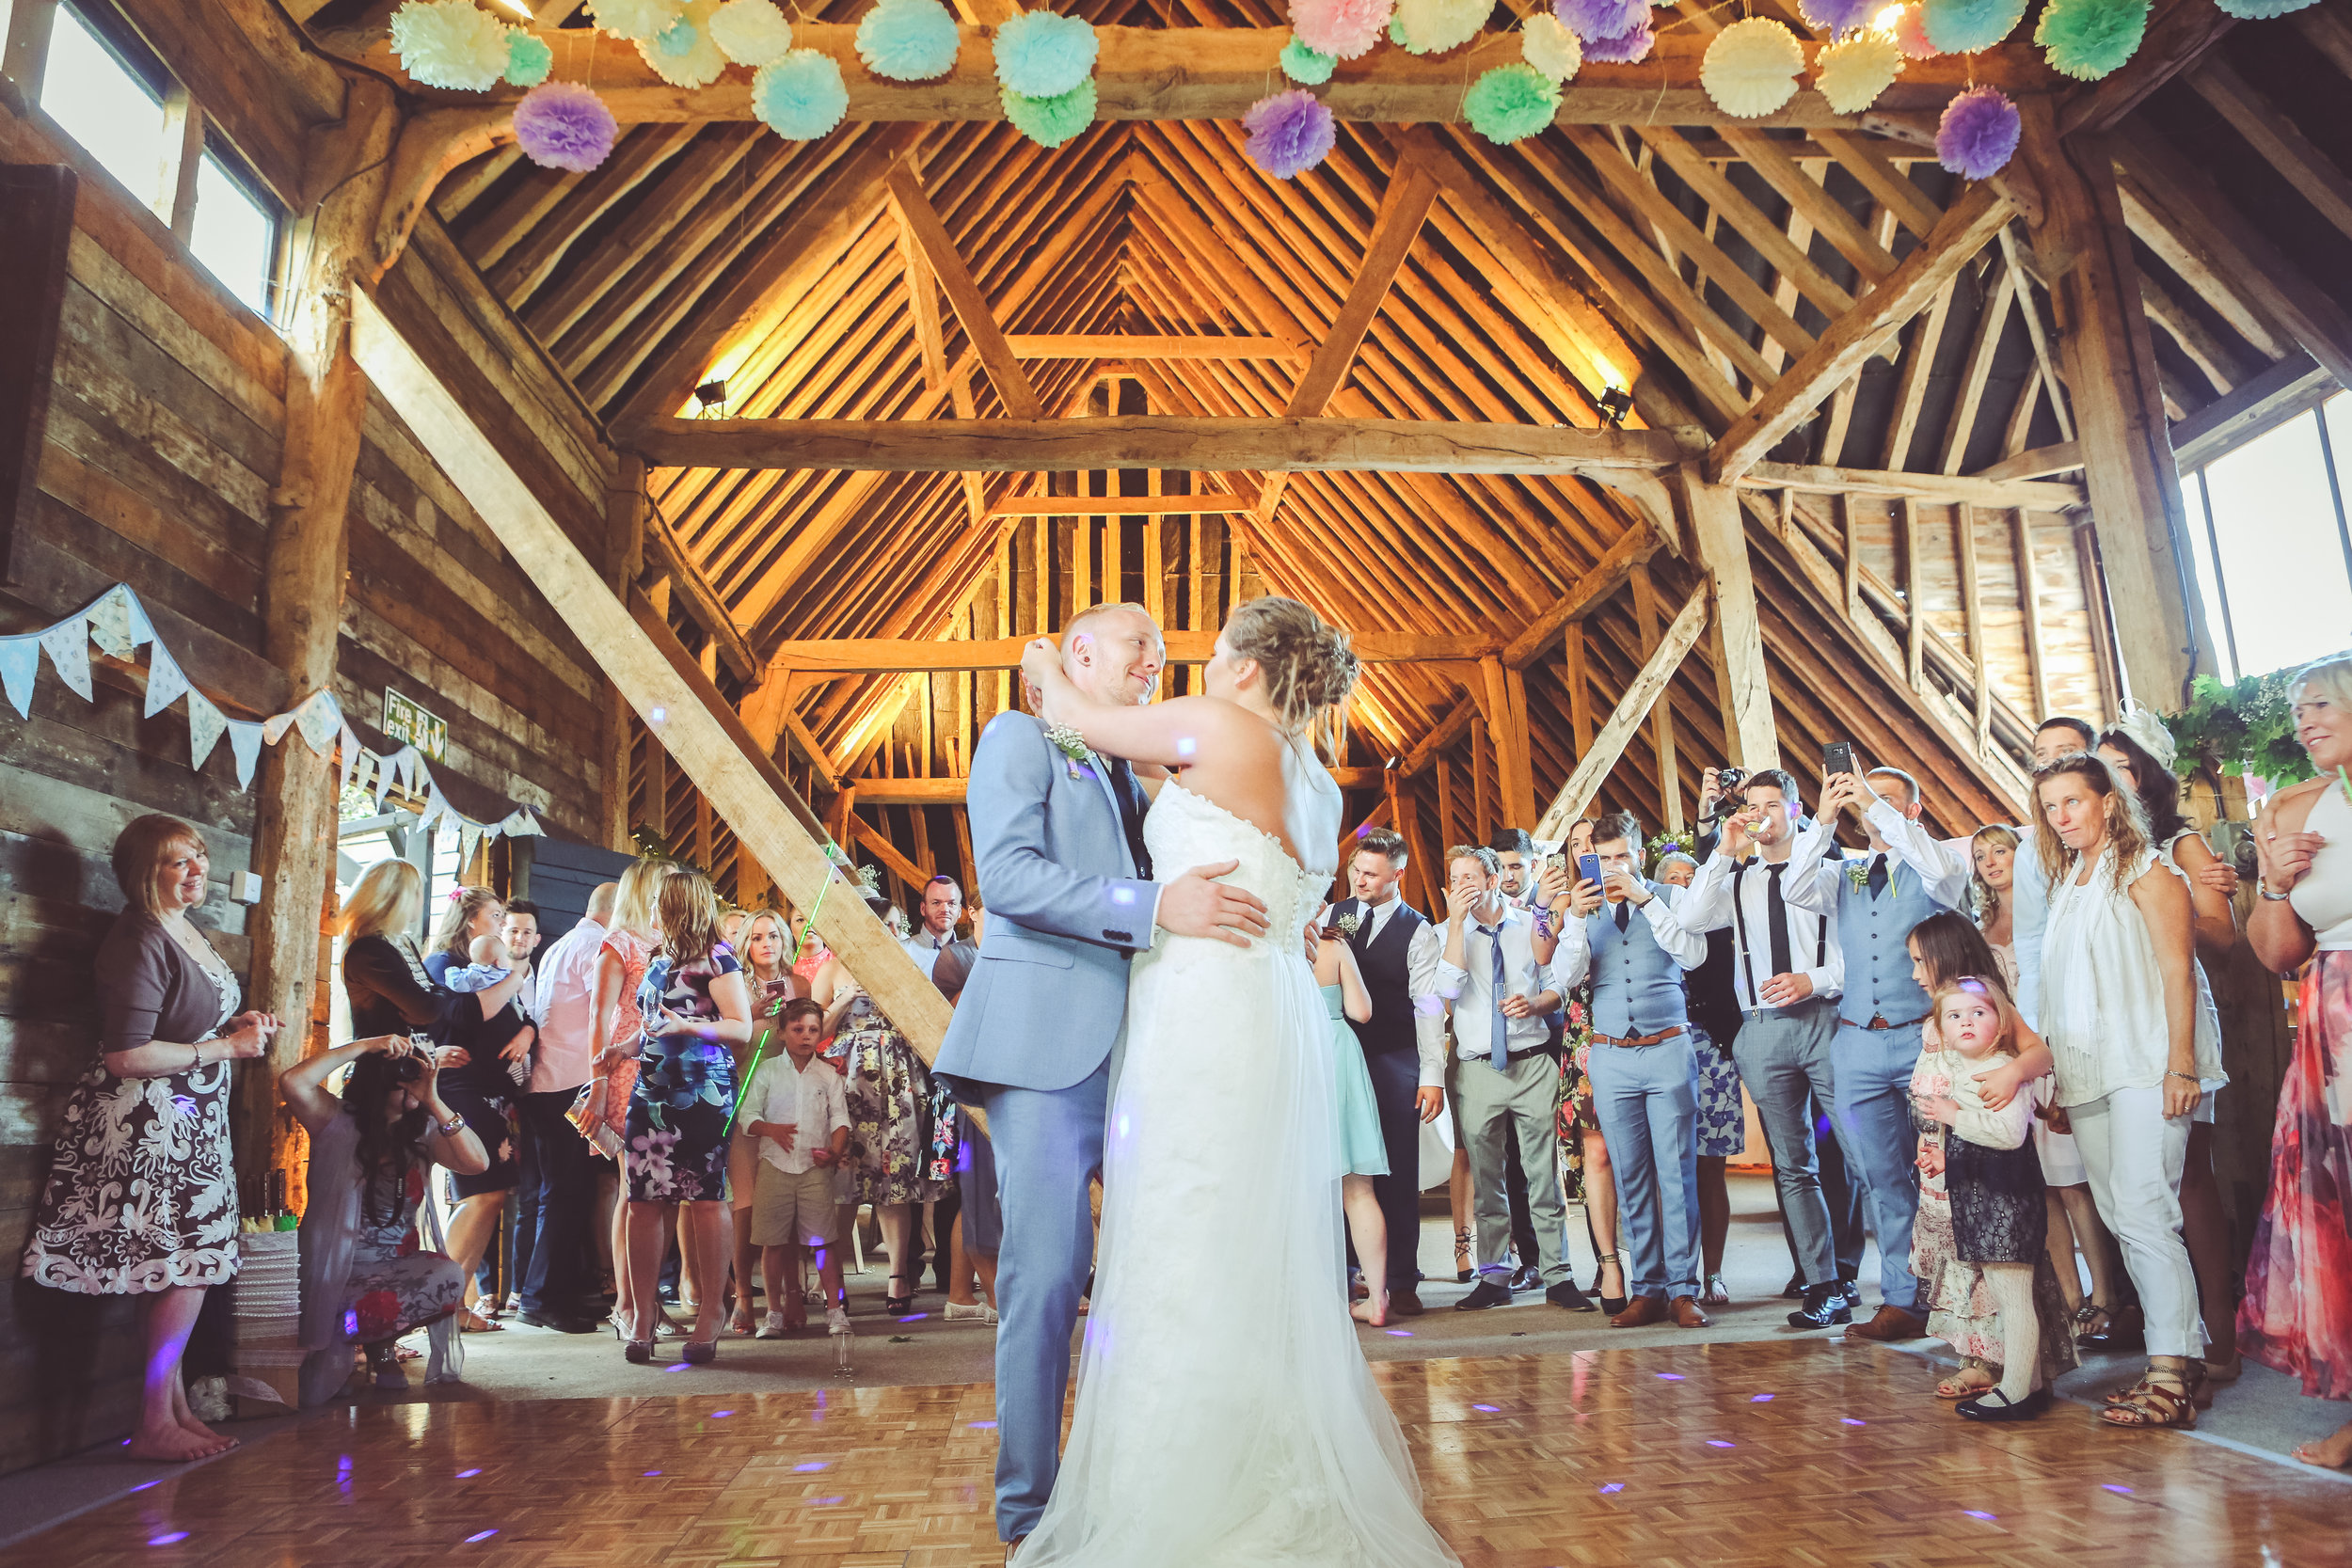 Amy & Adam Wedding - July 2nd 2016 Sussex BarnAmy & Adam Wedding - Sussex BarnFRNH2558.jpg